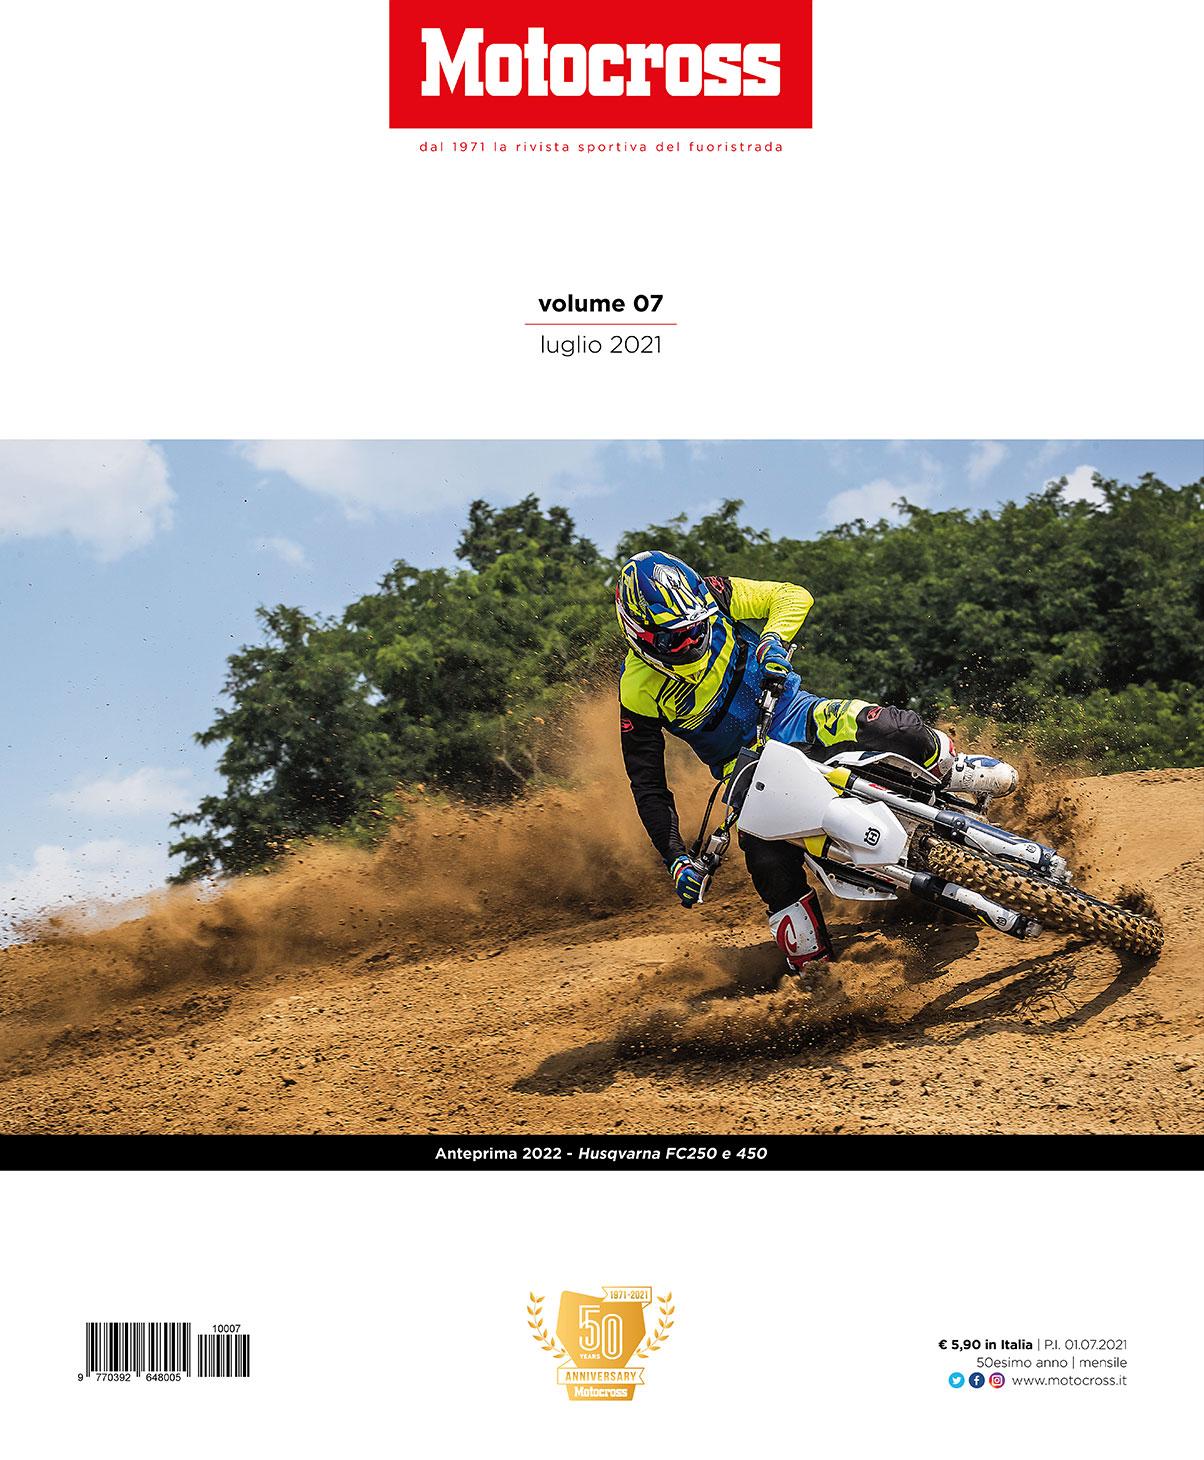 Motocross Luglio 2021